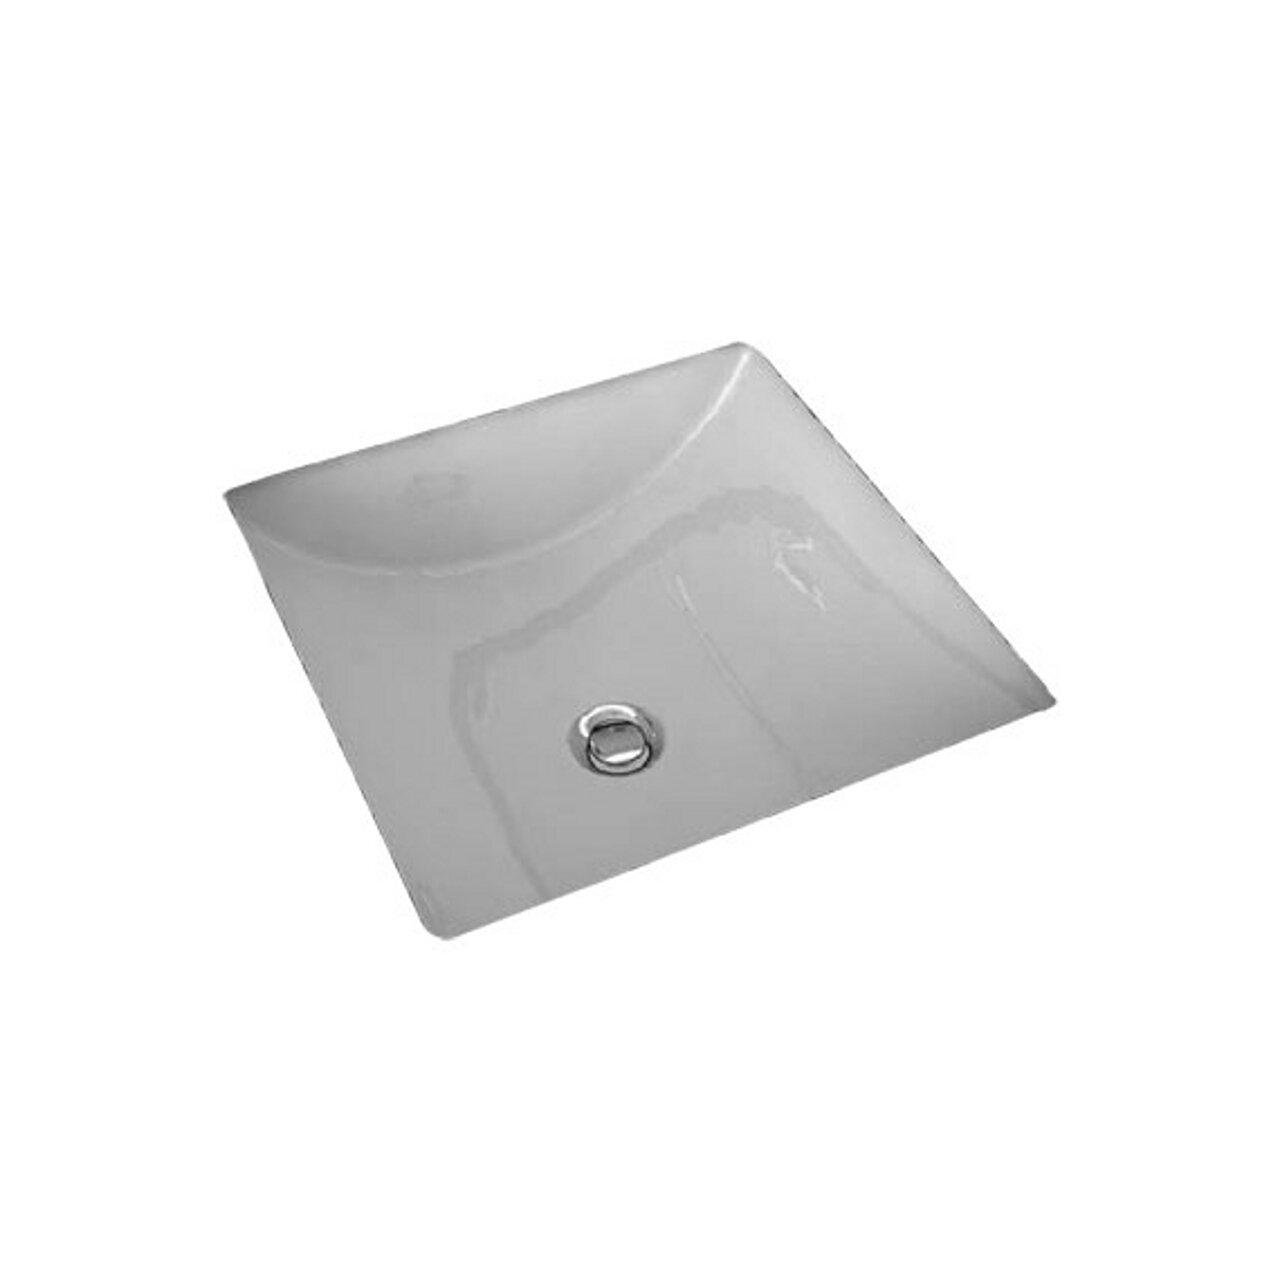 American Standard 0426000.020 Studio Carre 13 By 13 Inch Undercounter Sink,  White   Utility Sinks   Amazon.com